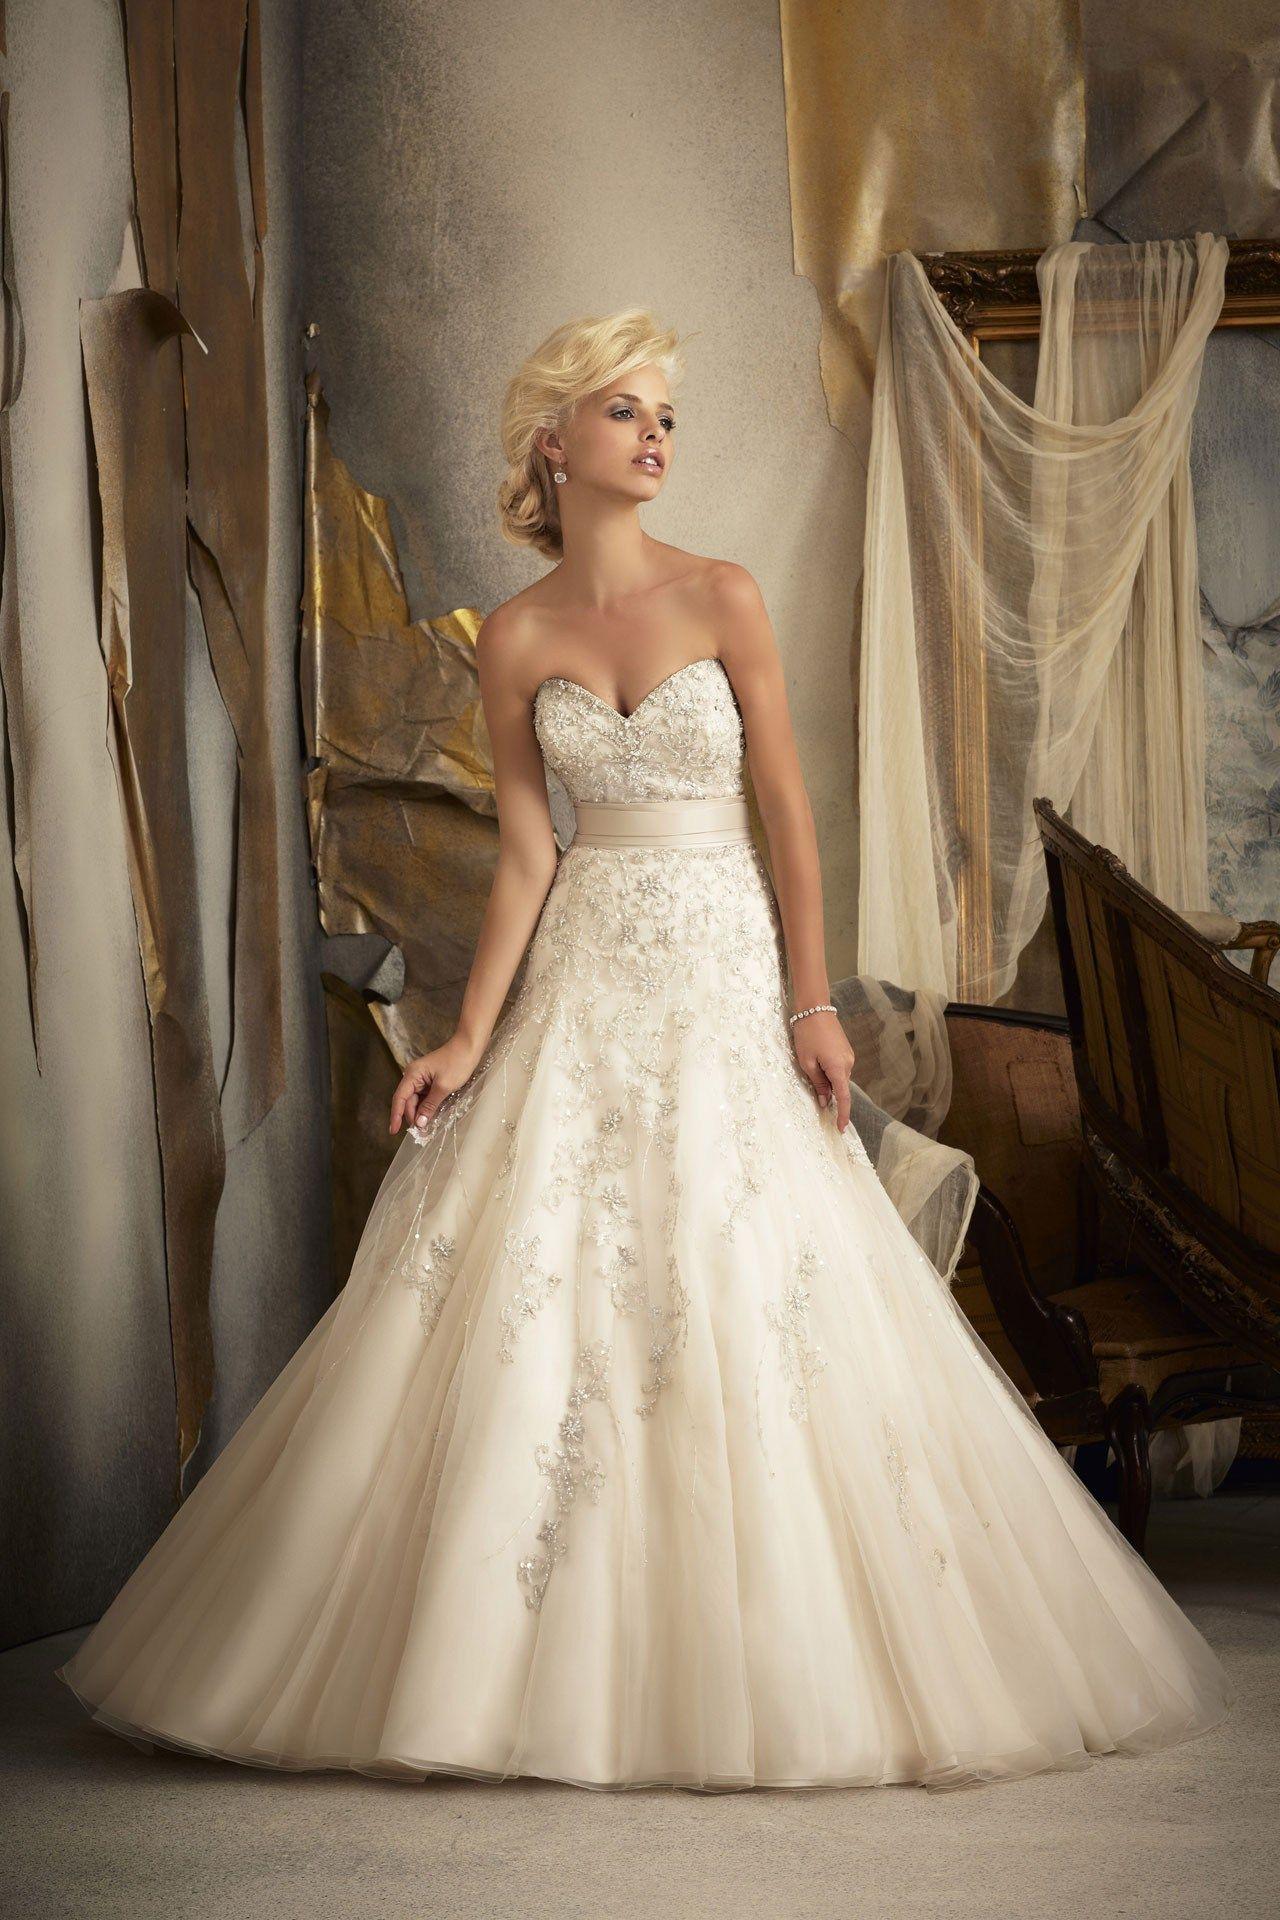 Champagne and ivory wedding dress  Wedding Dresses  The Ultimate Gallery BridesMagazine  Mori